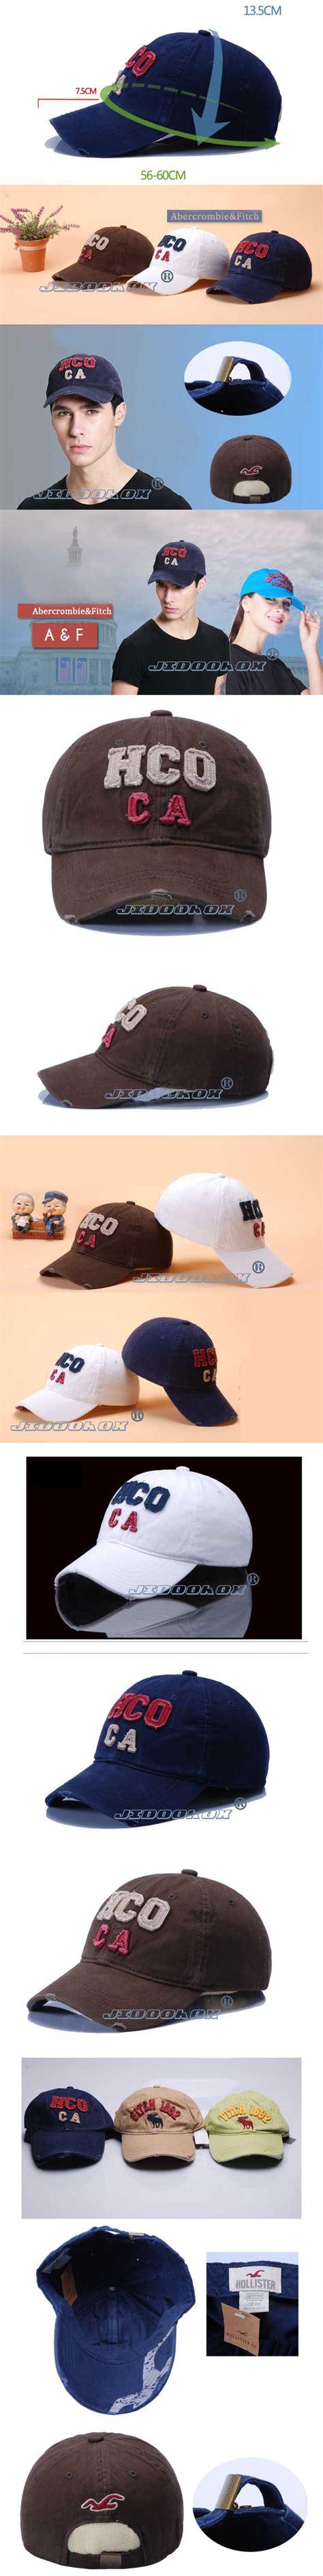 Jual Topi Branded Murah jual topi pria branded